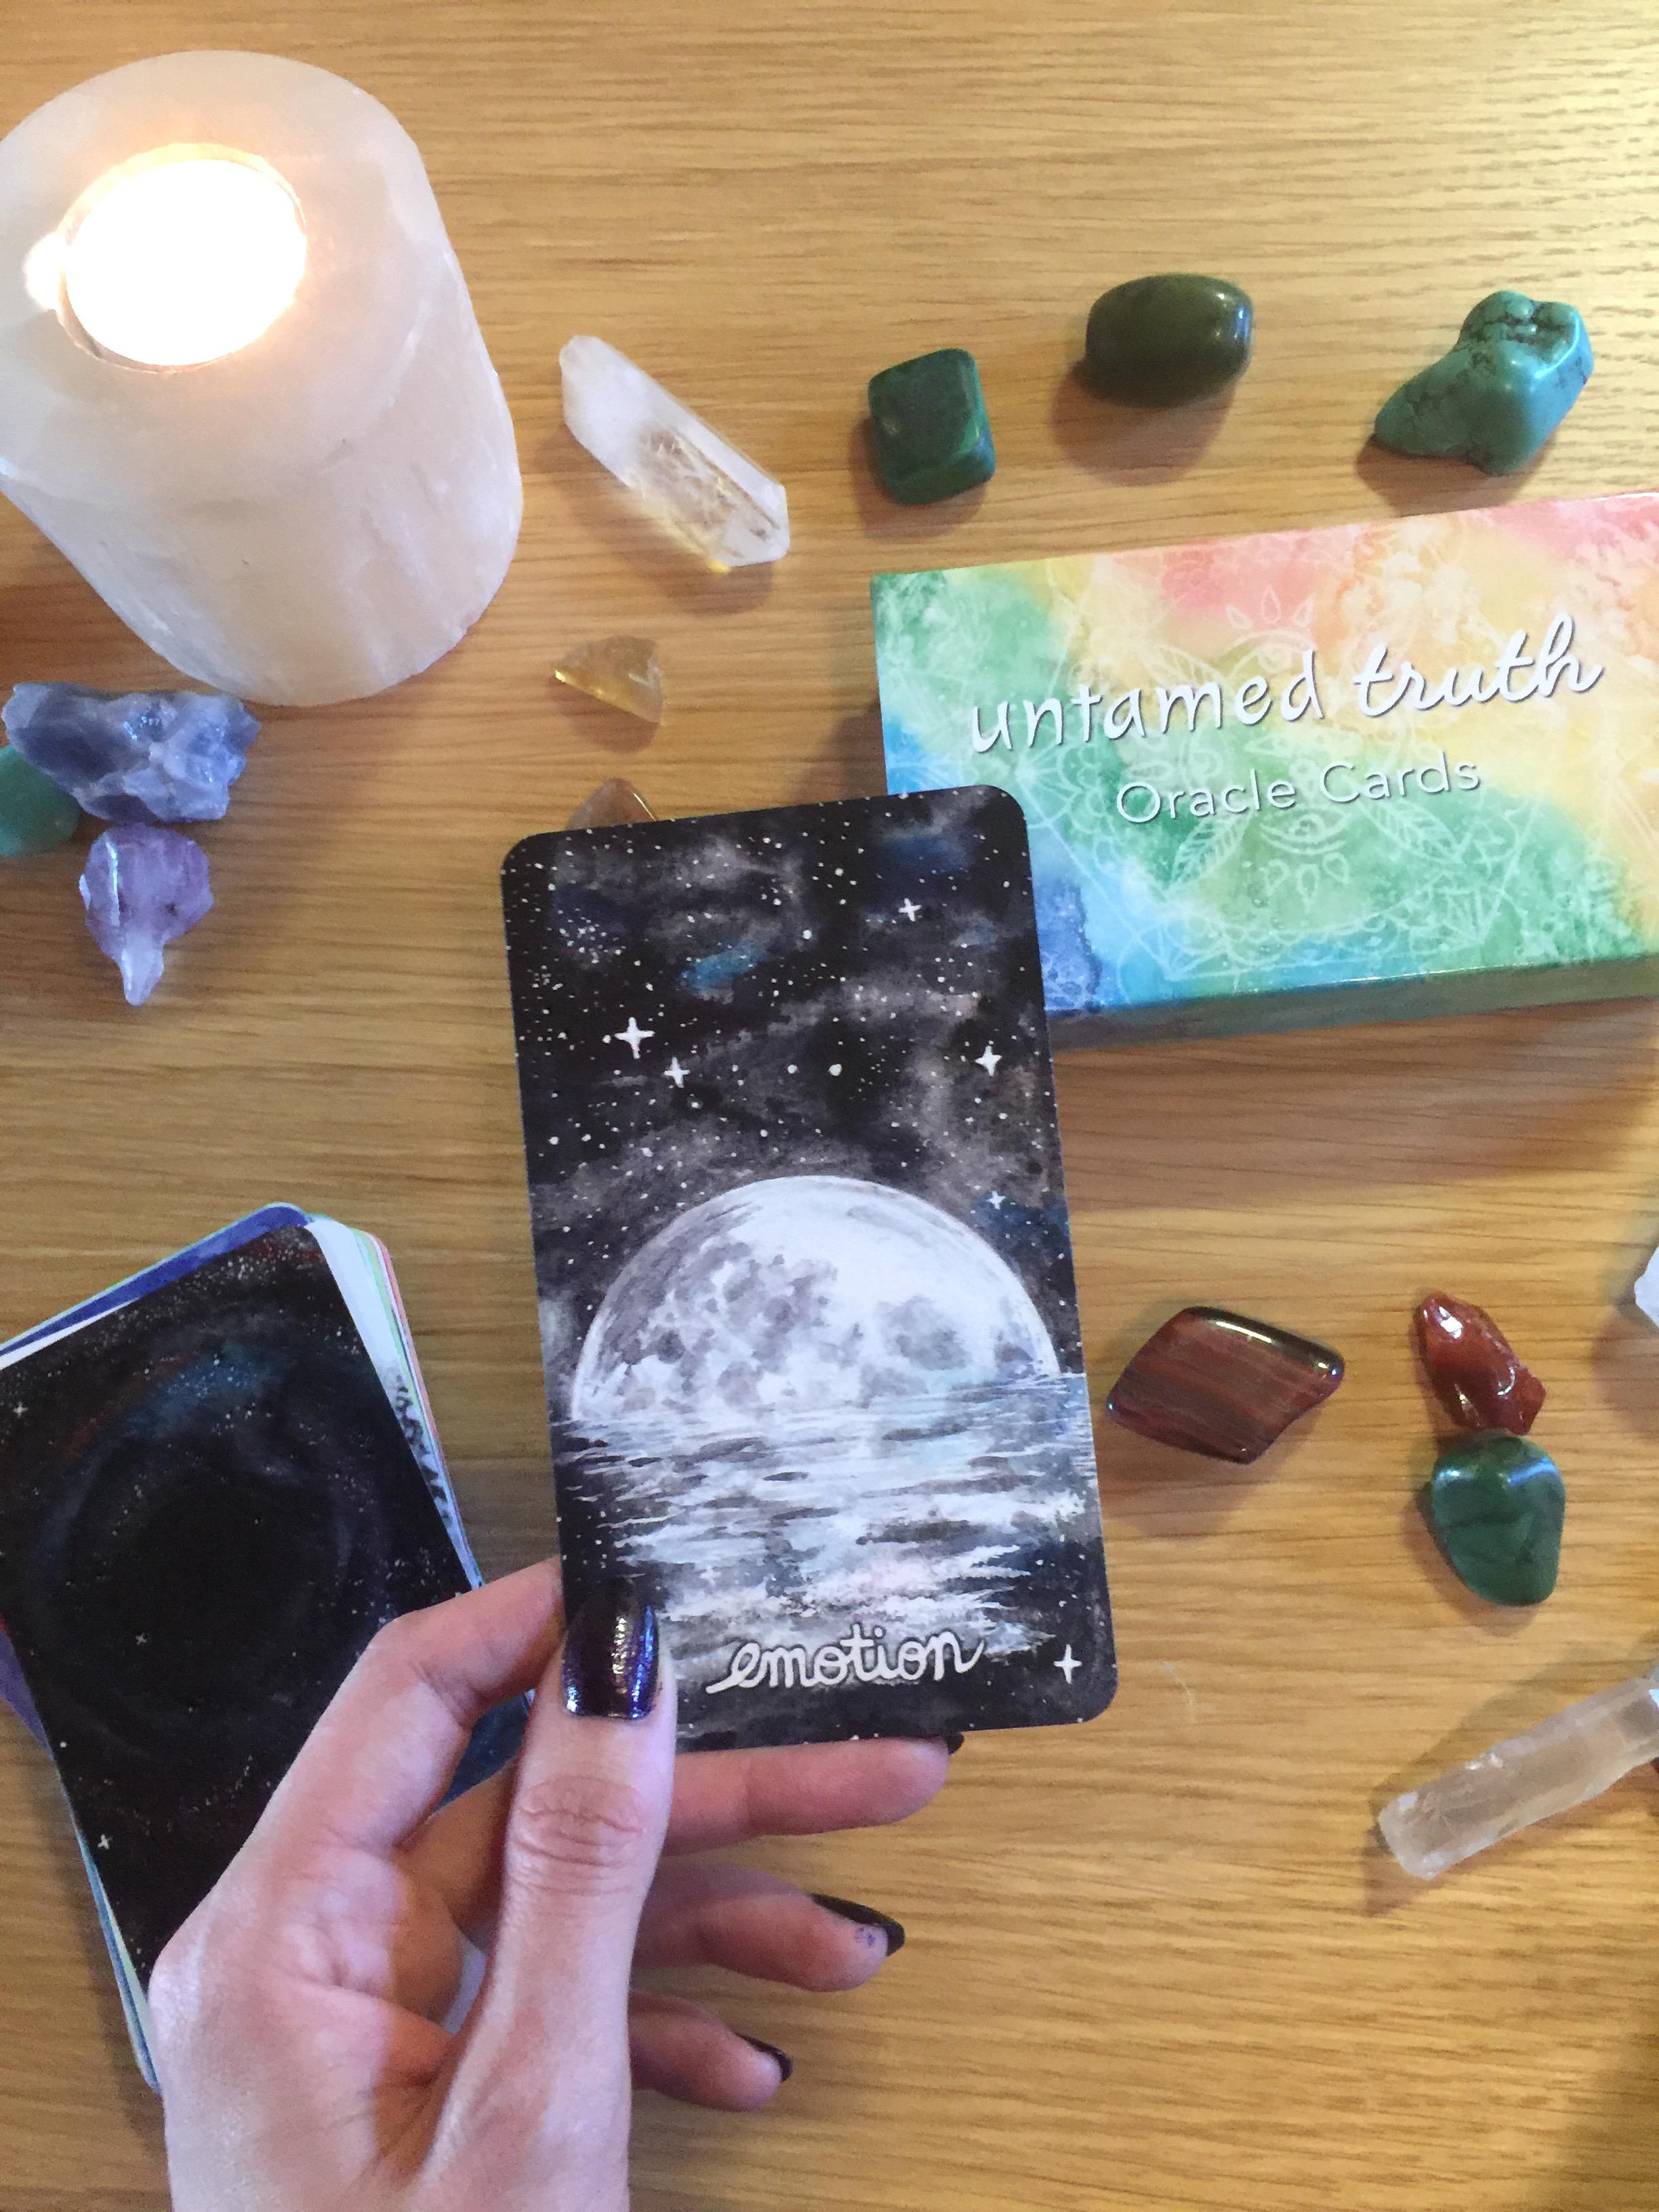 Untamed Truth Oracle | Tree Talker Art